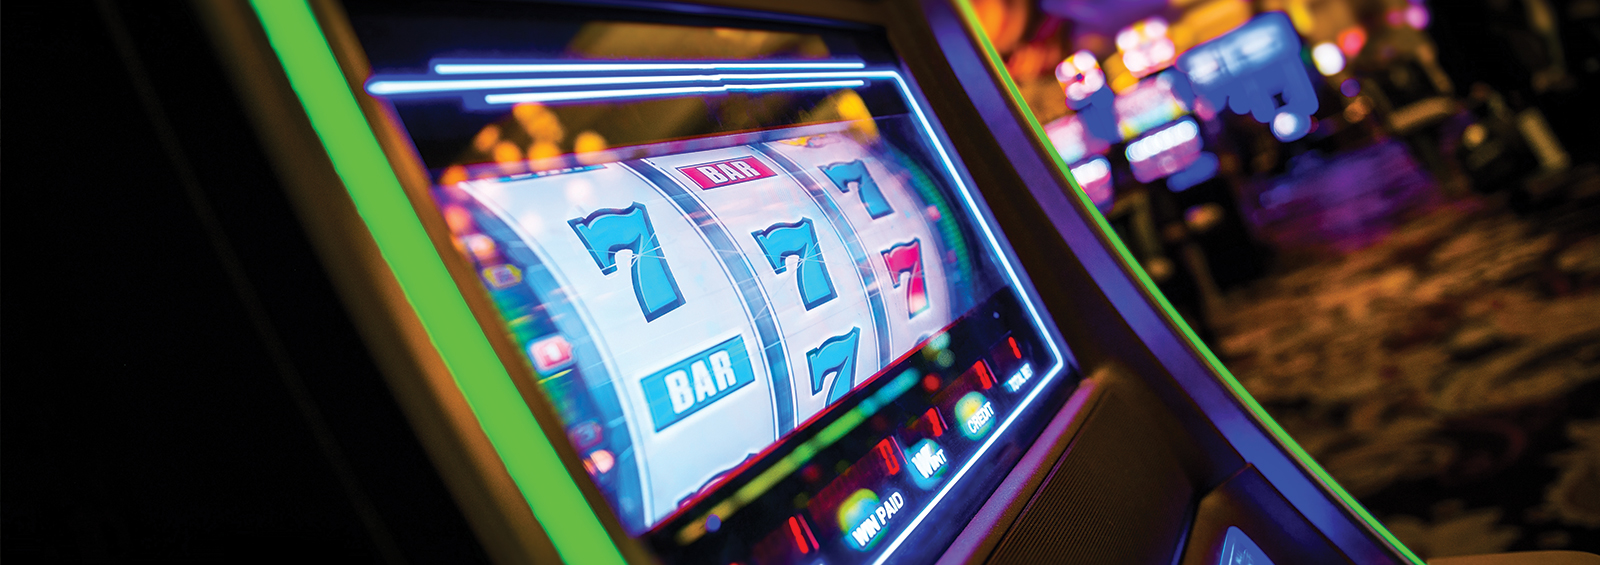 Diamondjacks casino and hotel